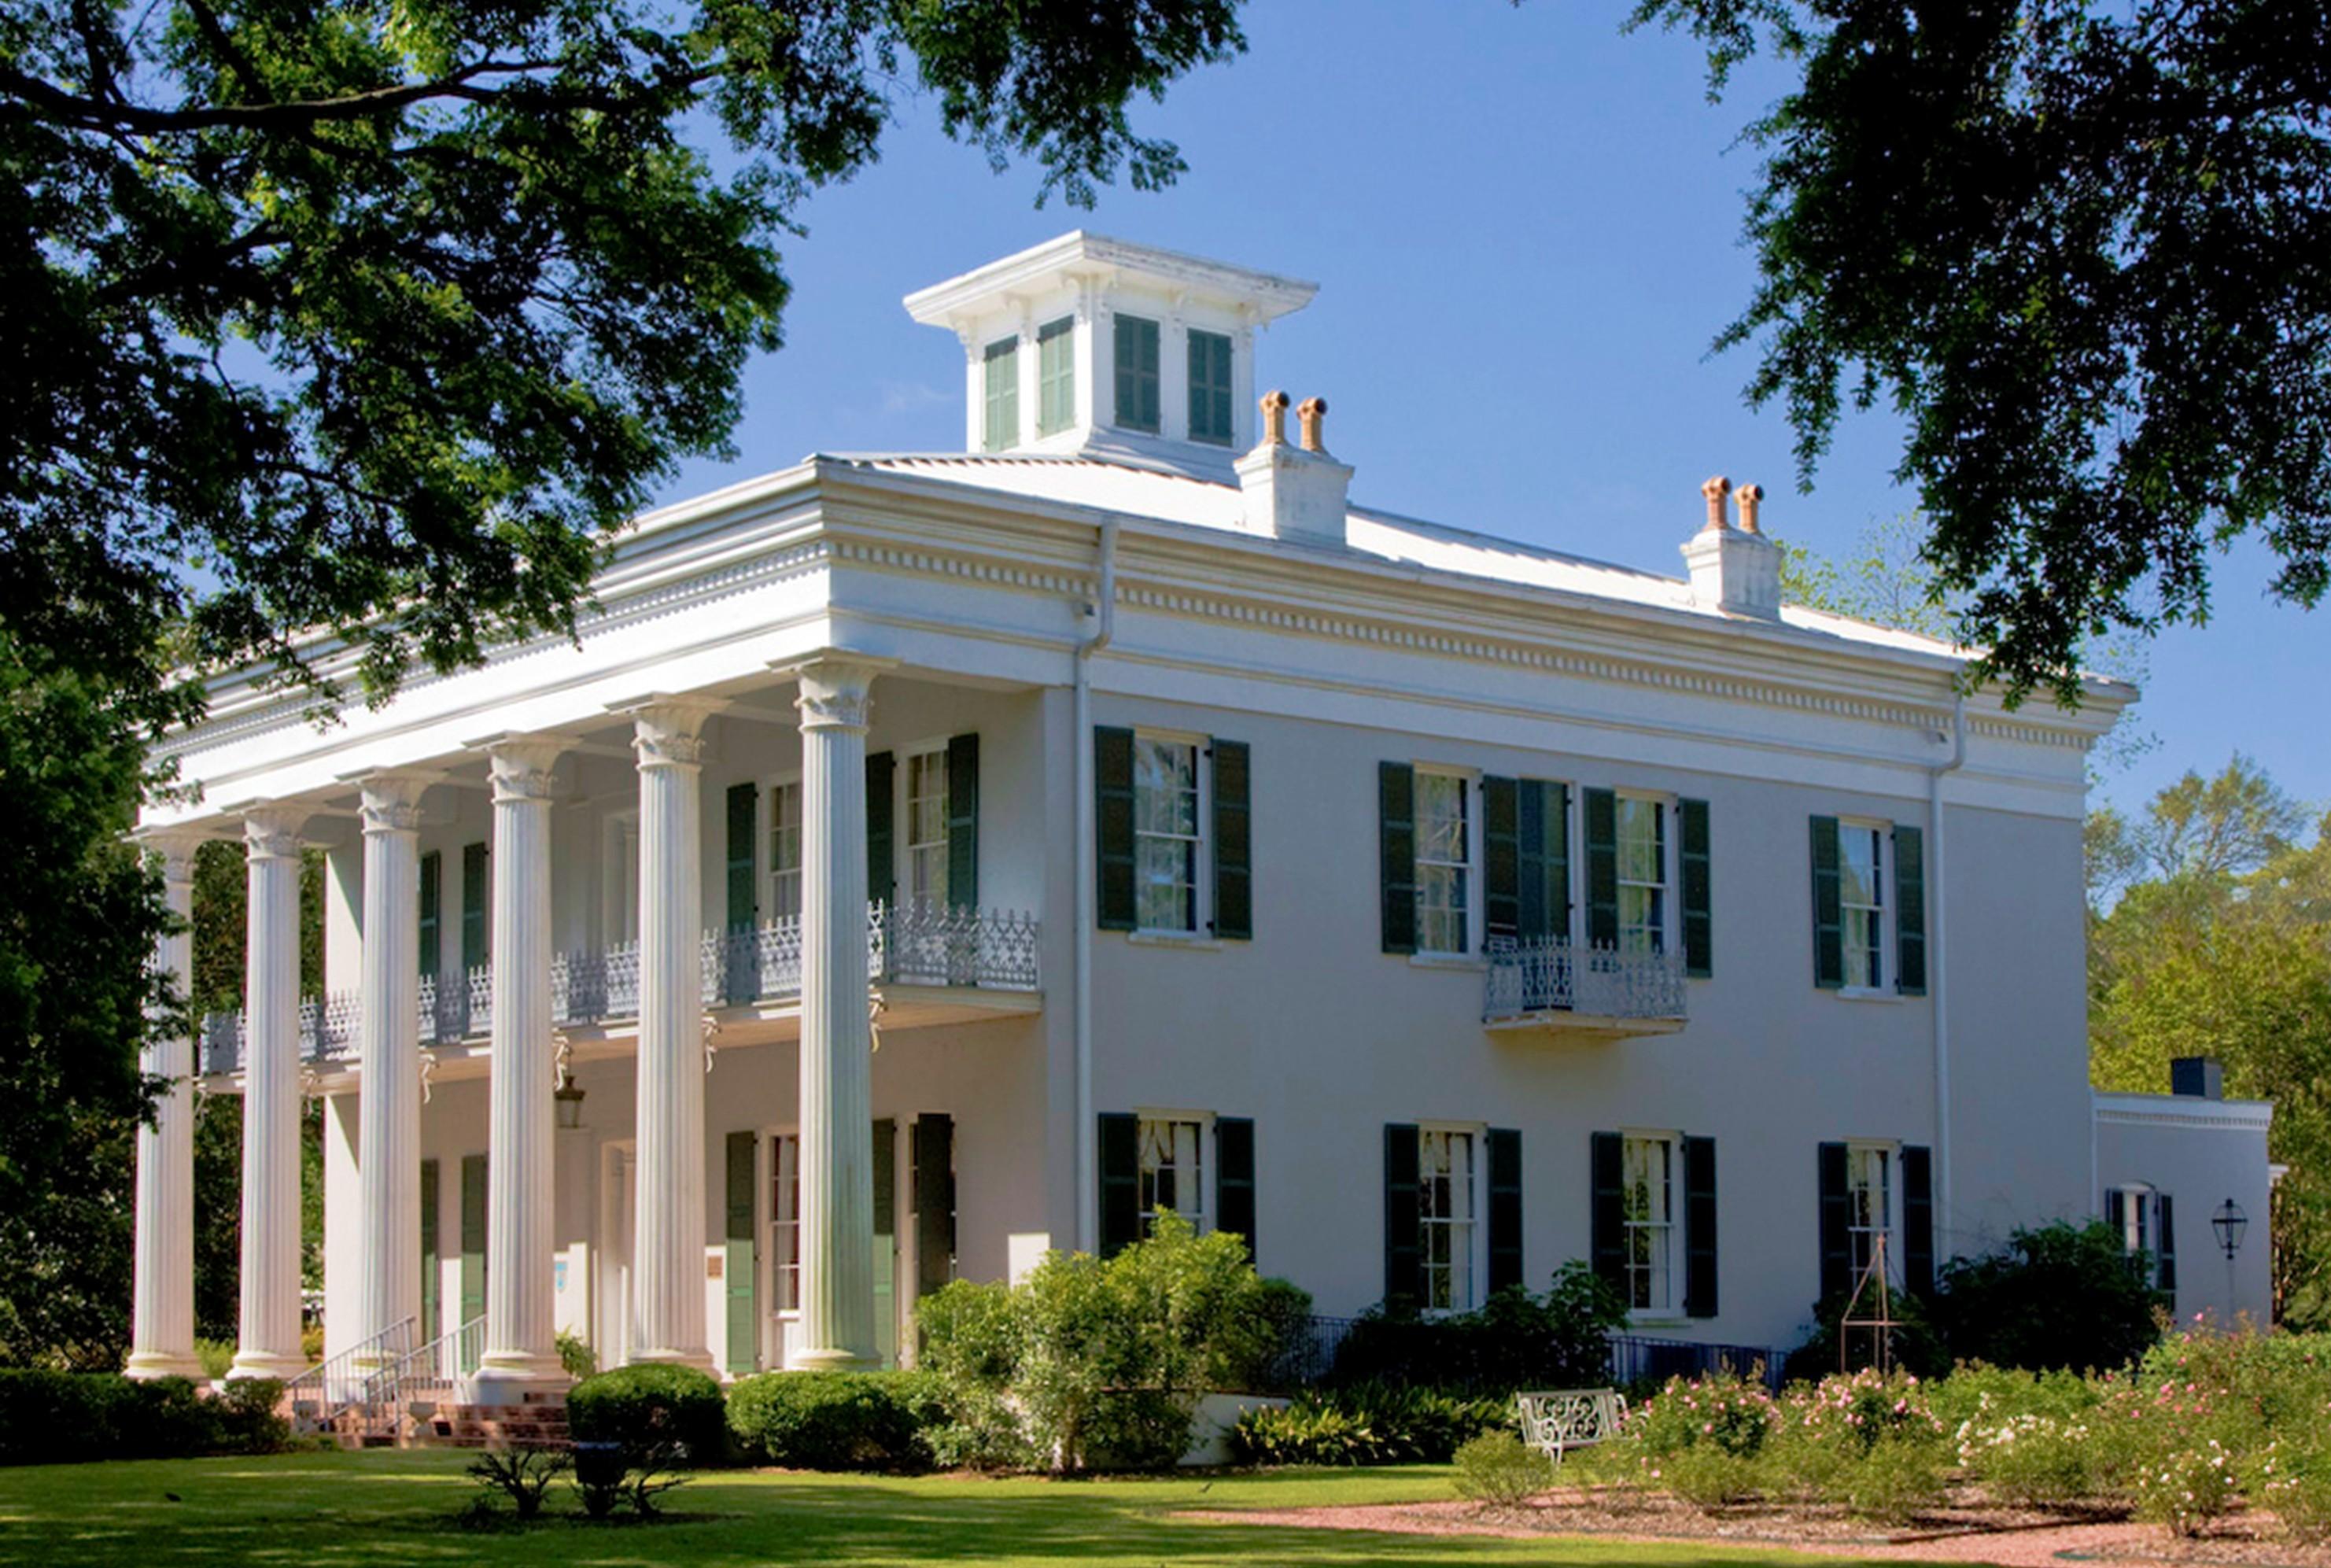 File:Sturdivant Hall Selma.jpg - Wikimedia Commons